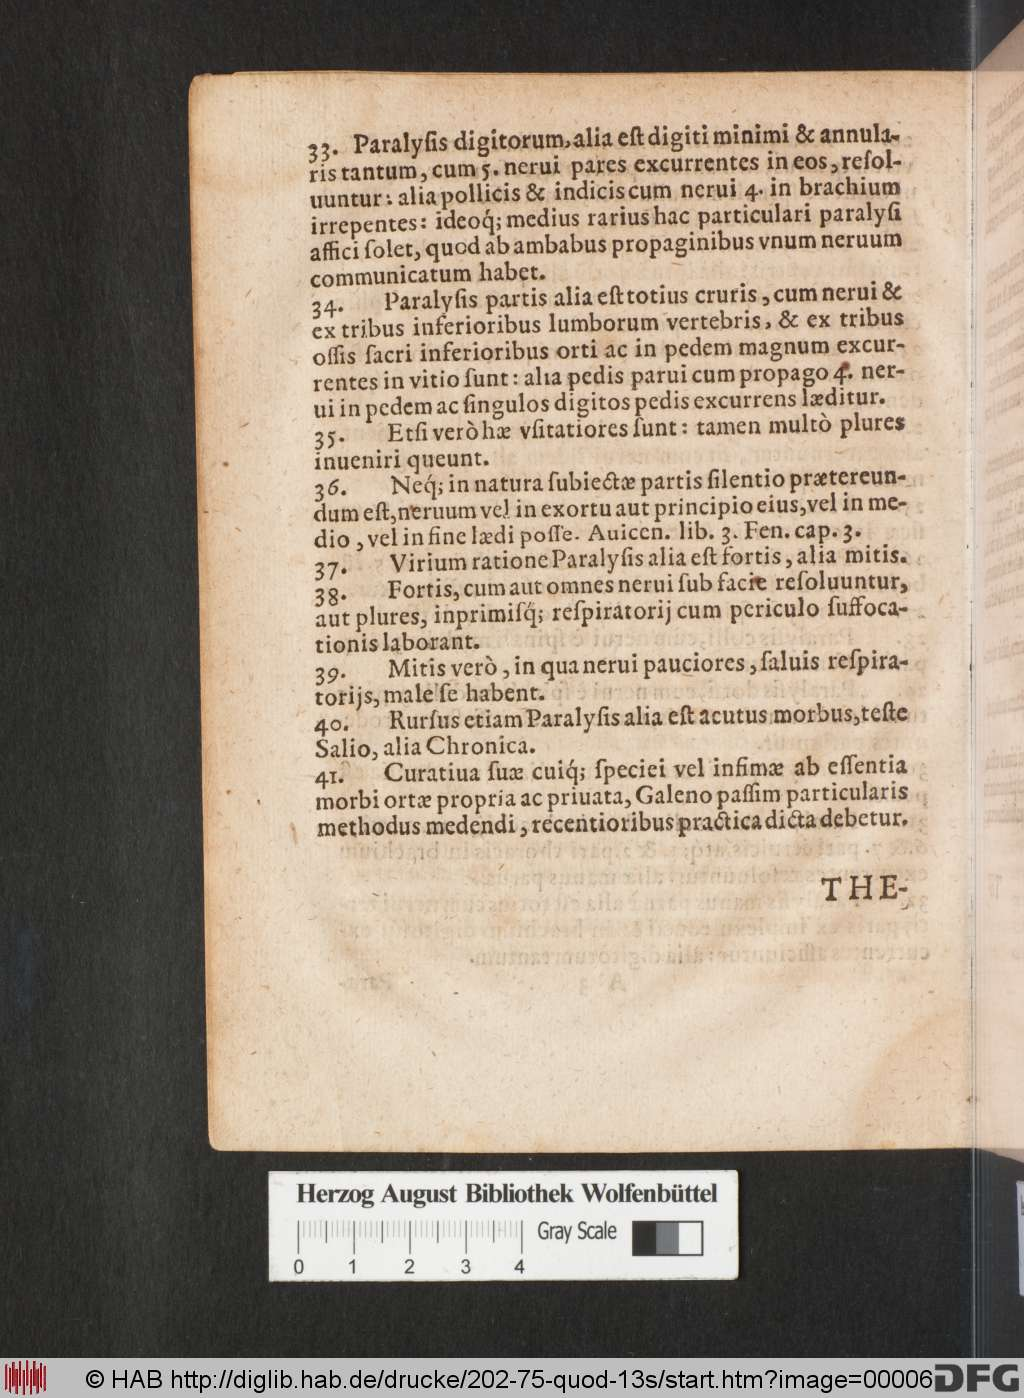 http://diglib.hab.de/drucke/202-75-quod-13s/00006.jpg